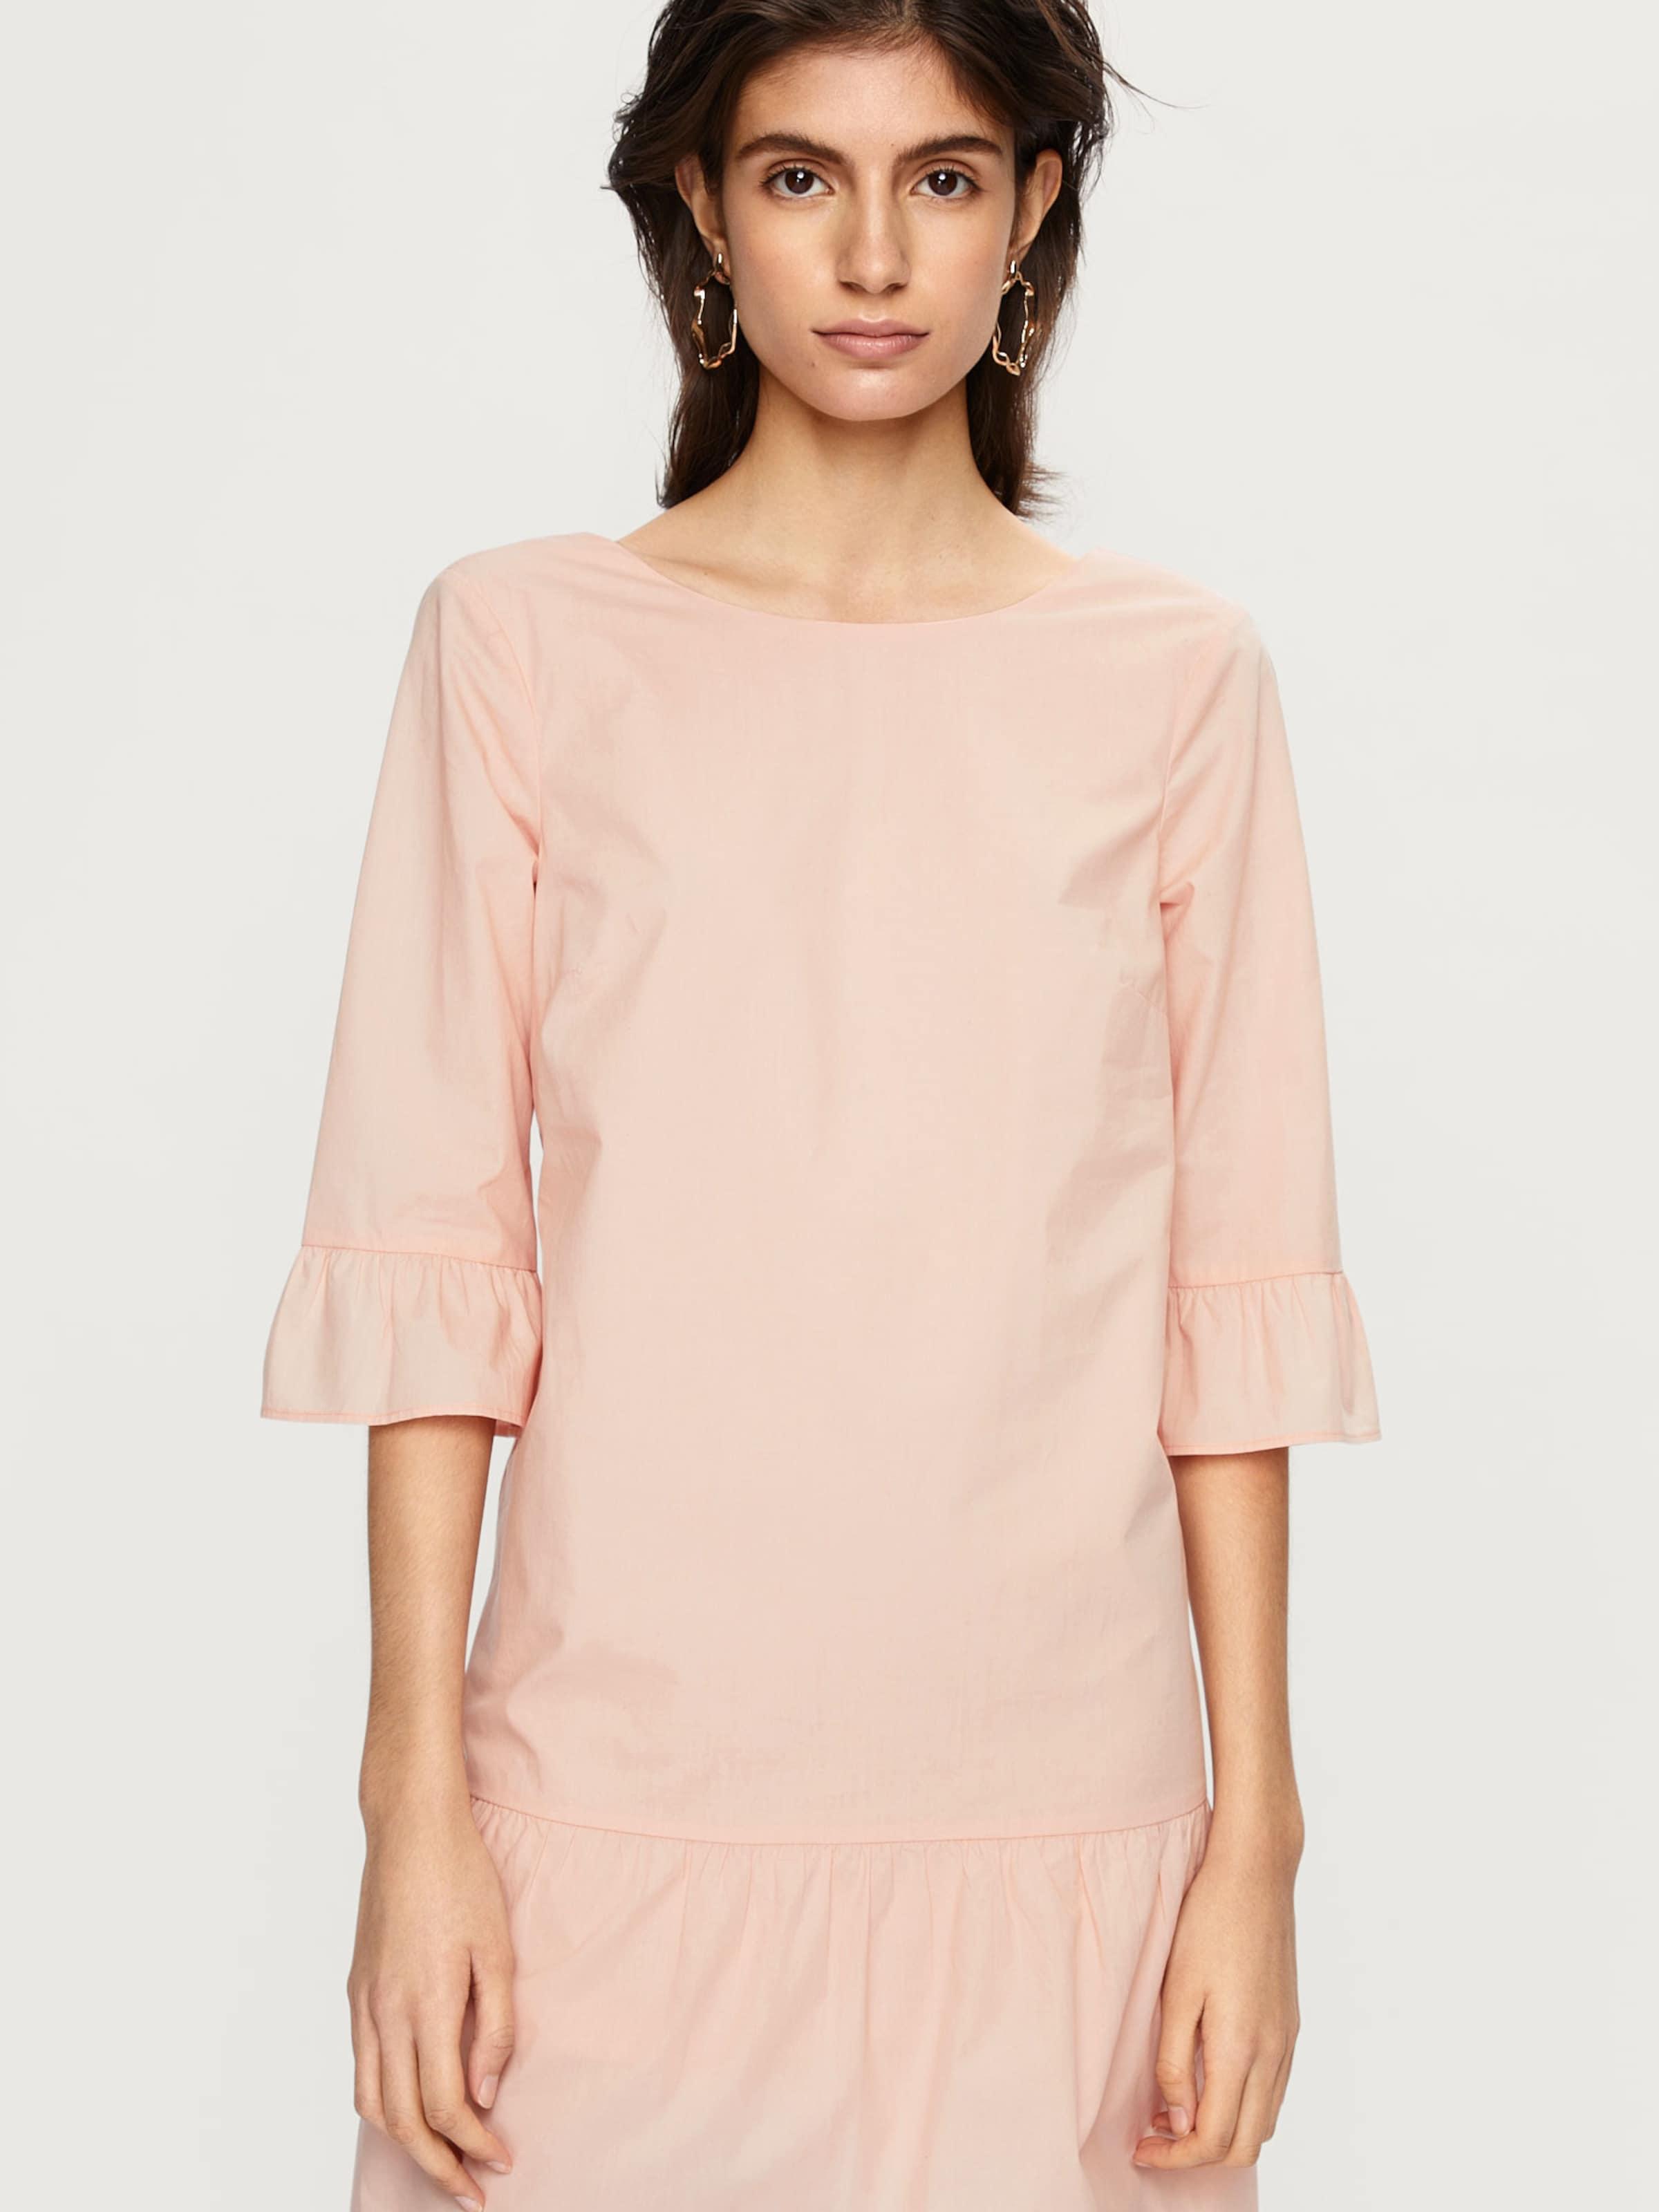 Edited Kleid Apricot Edited In In 'aurora' 'aurora' Kleid Edited In Apricot Kleid 'aurora' 7vfy6Ybg